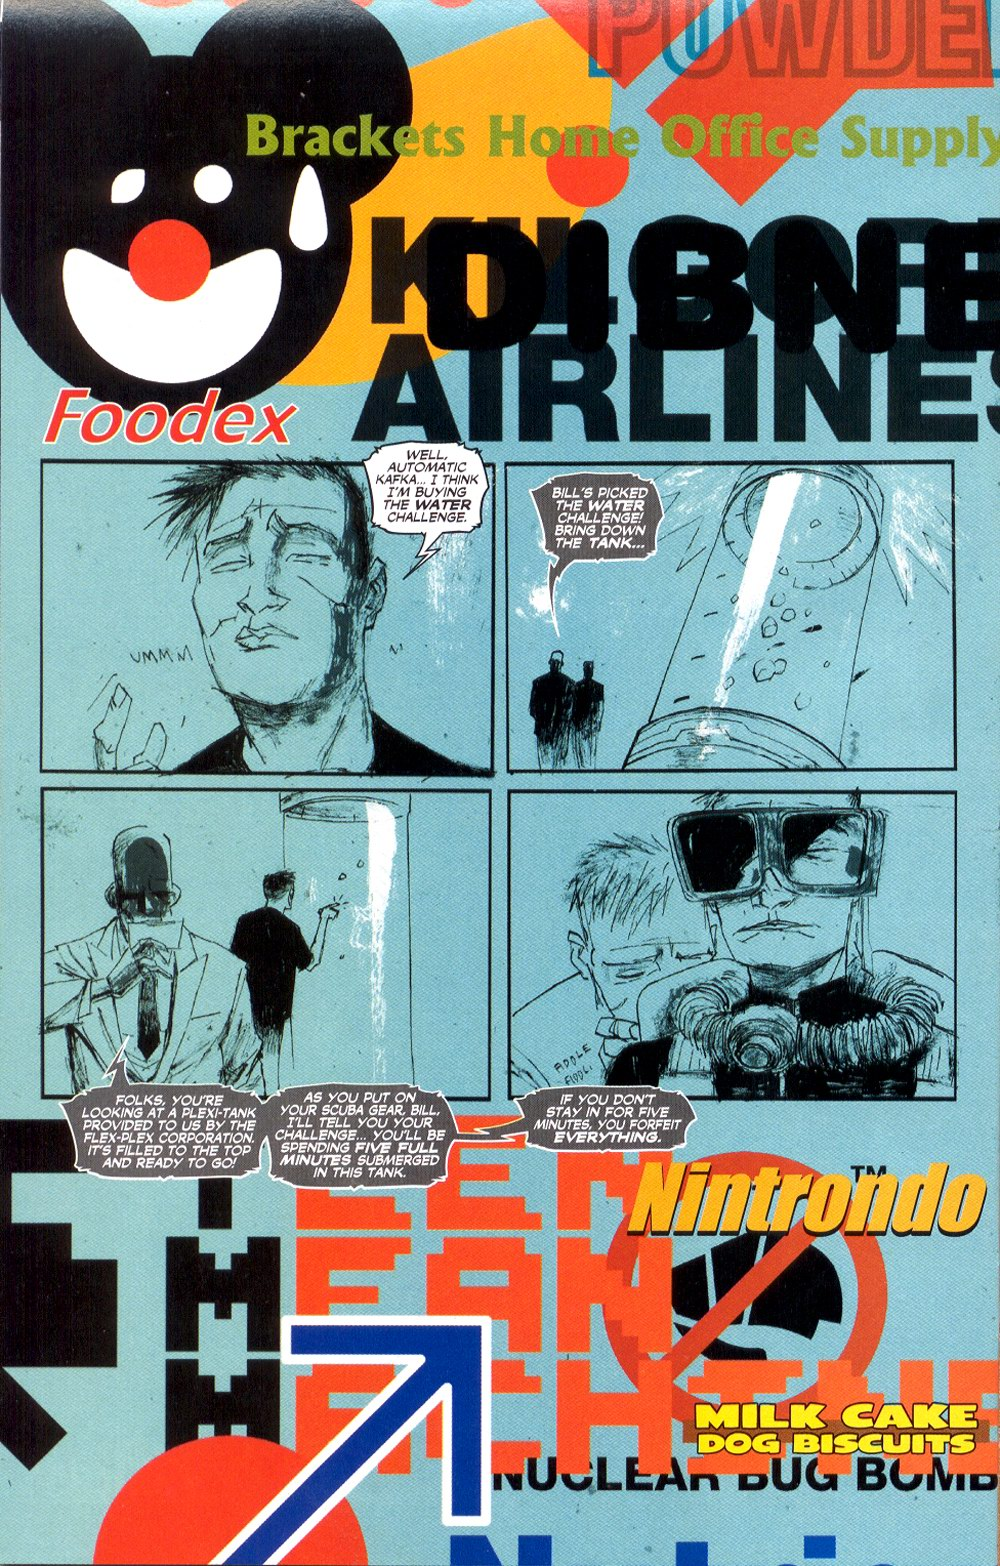 Read online Automatic Kafka comic -  Issue #3 - 14